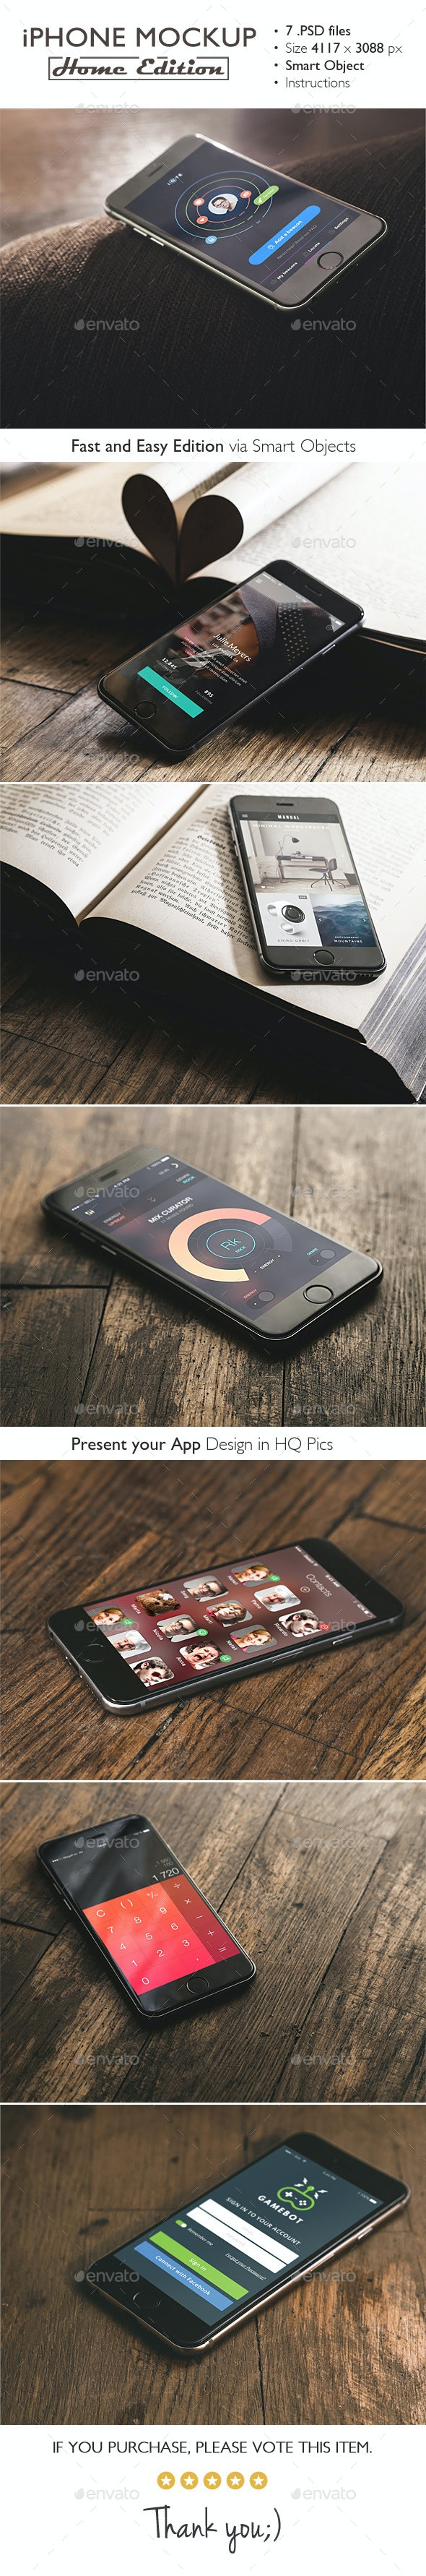 iPhone 6 Mockup Home Edition - Product Mock-Ups Graphics